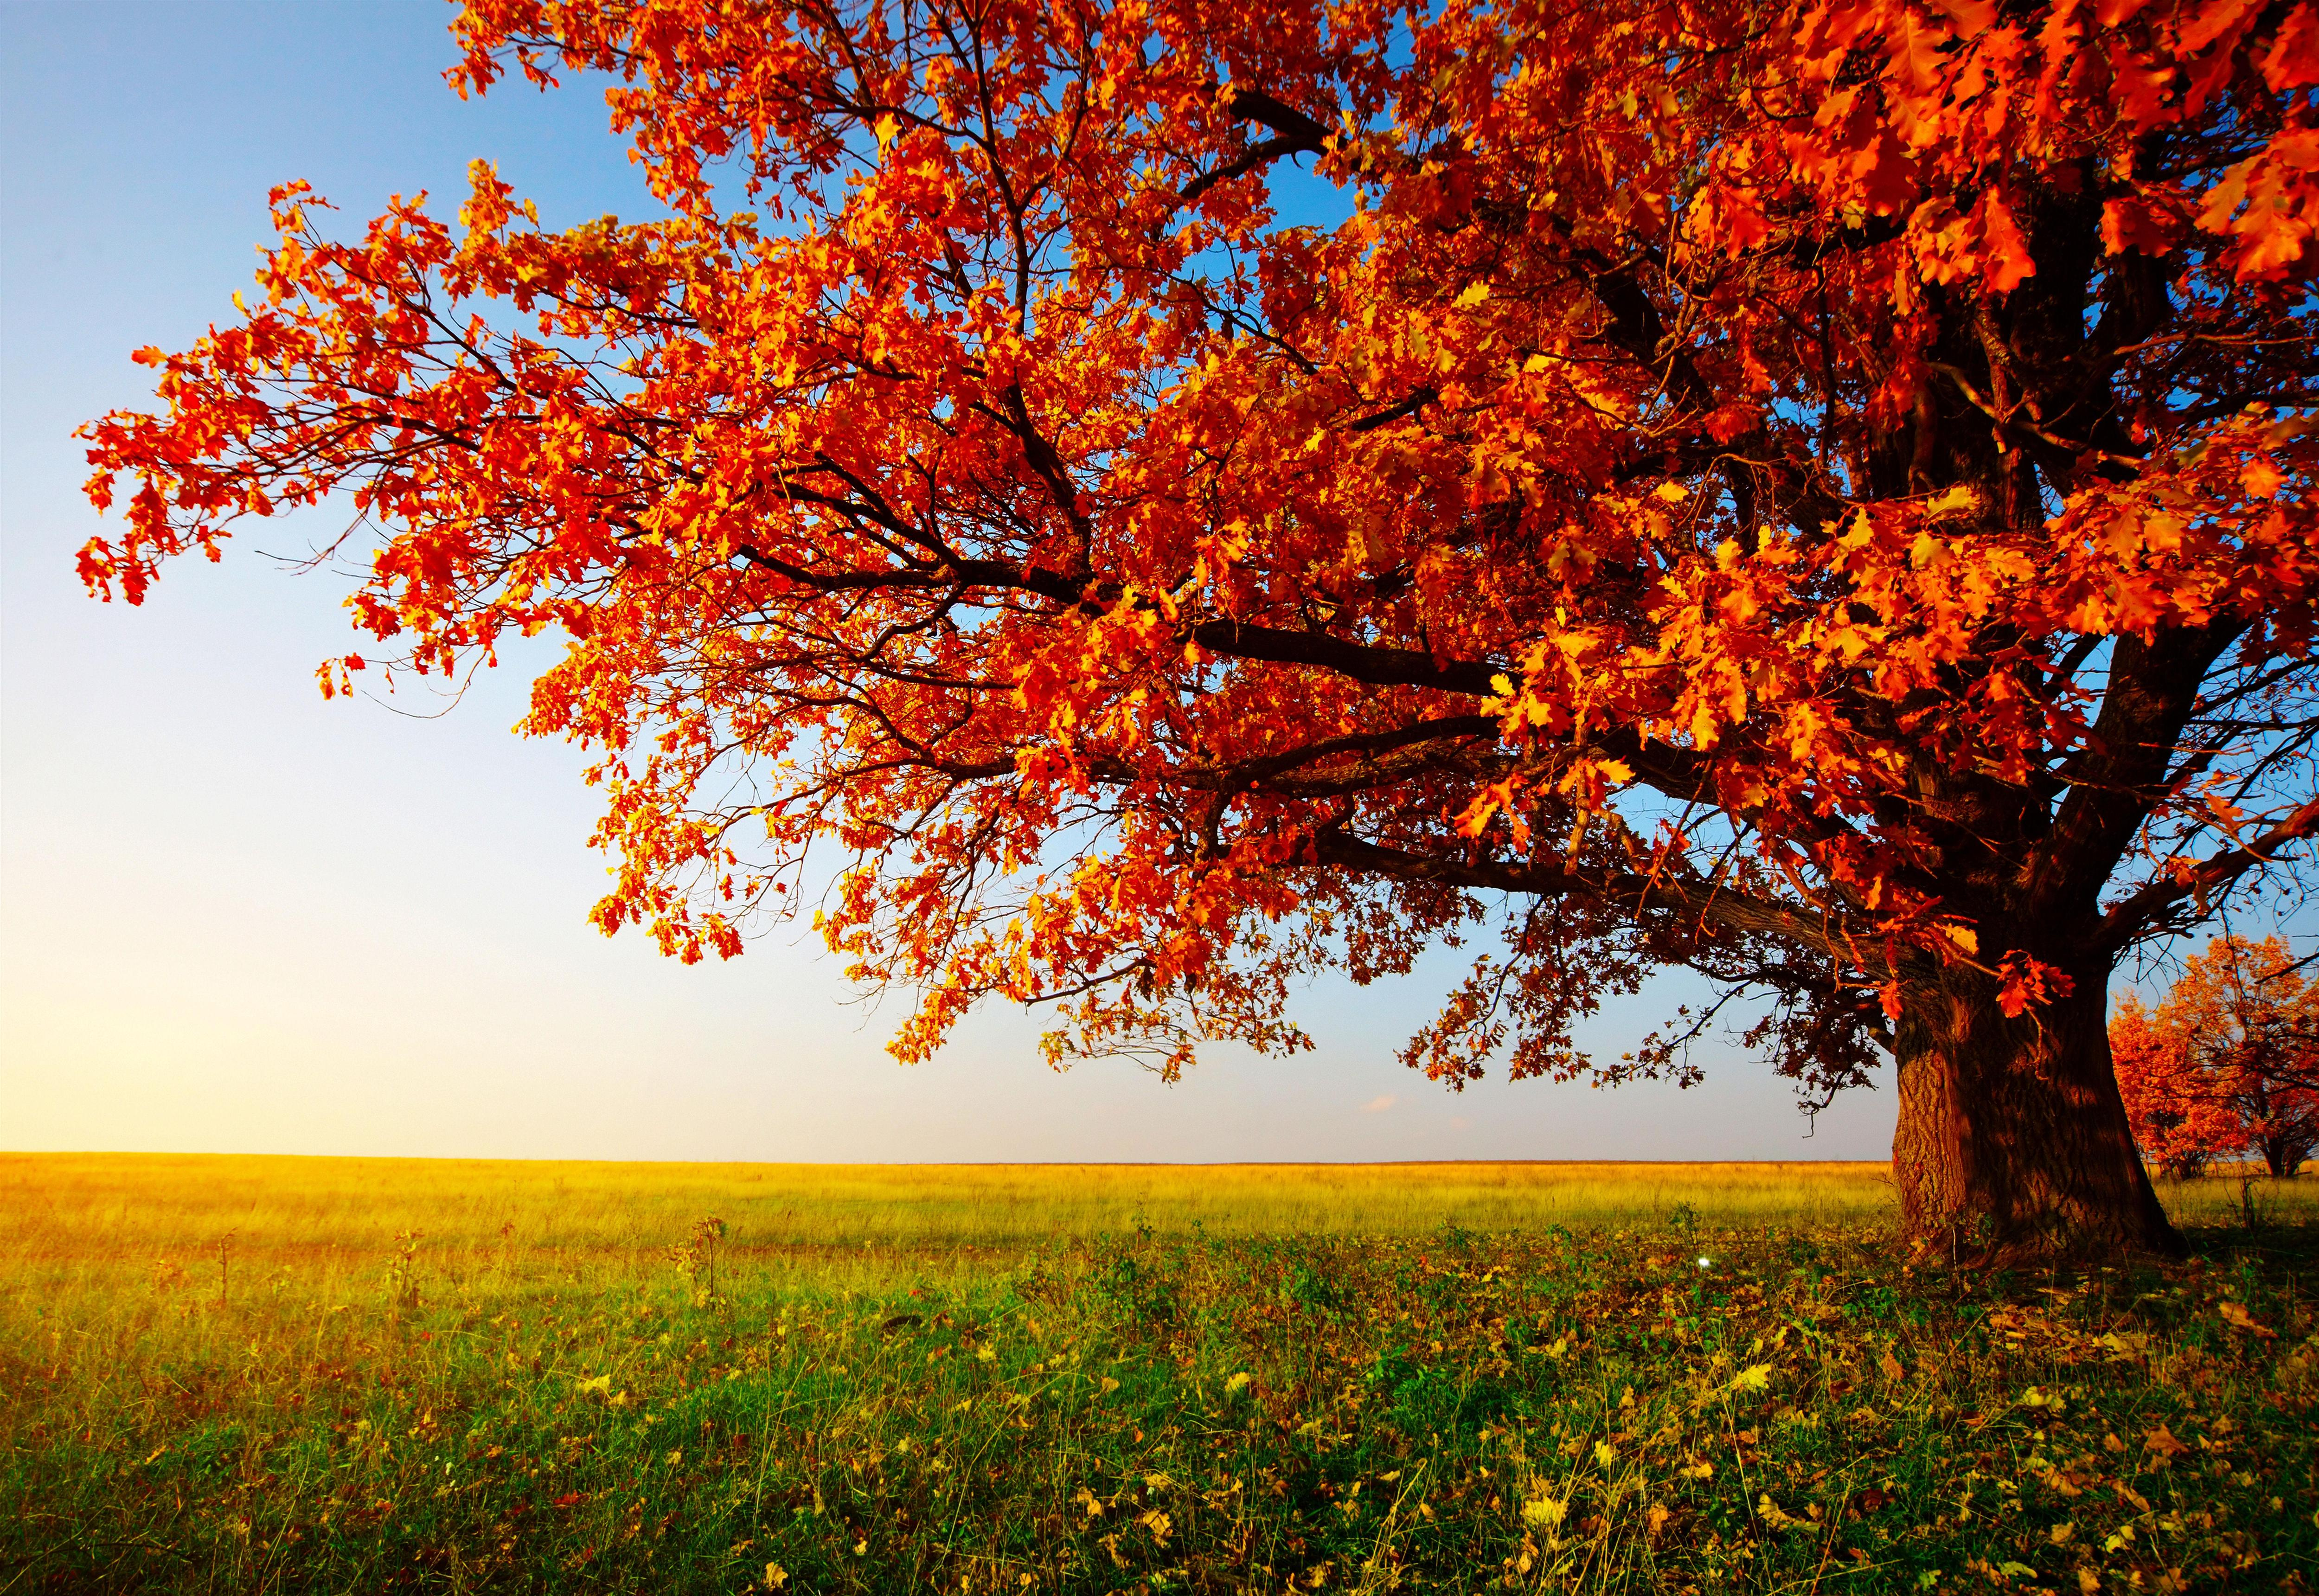 httpbigbackgroundcomautumnautumn trees desktop wallpaperhtml 5000x3441